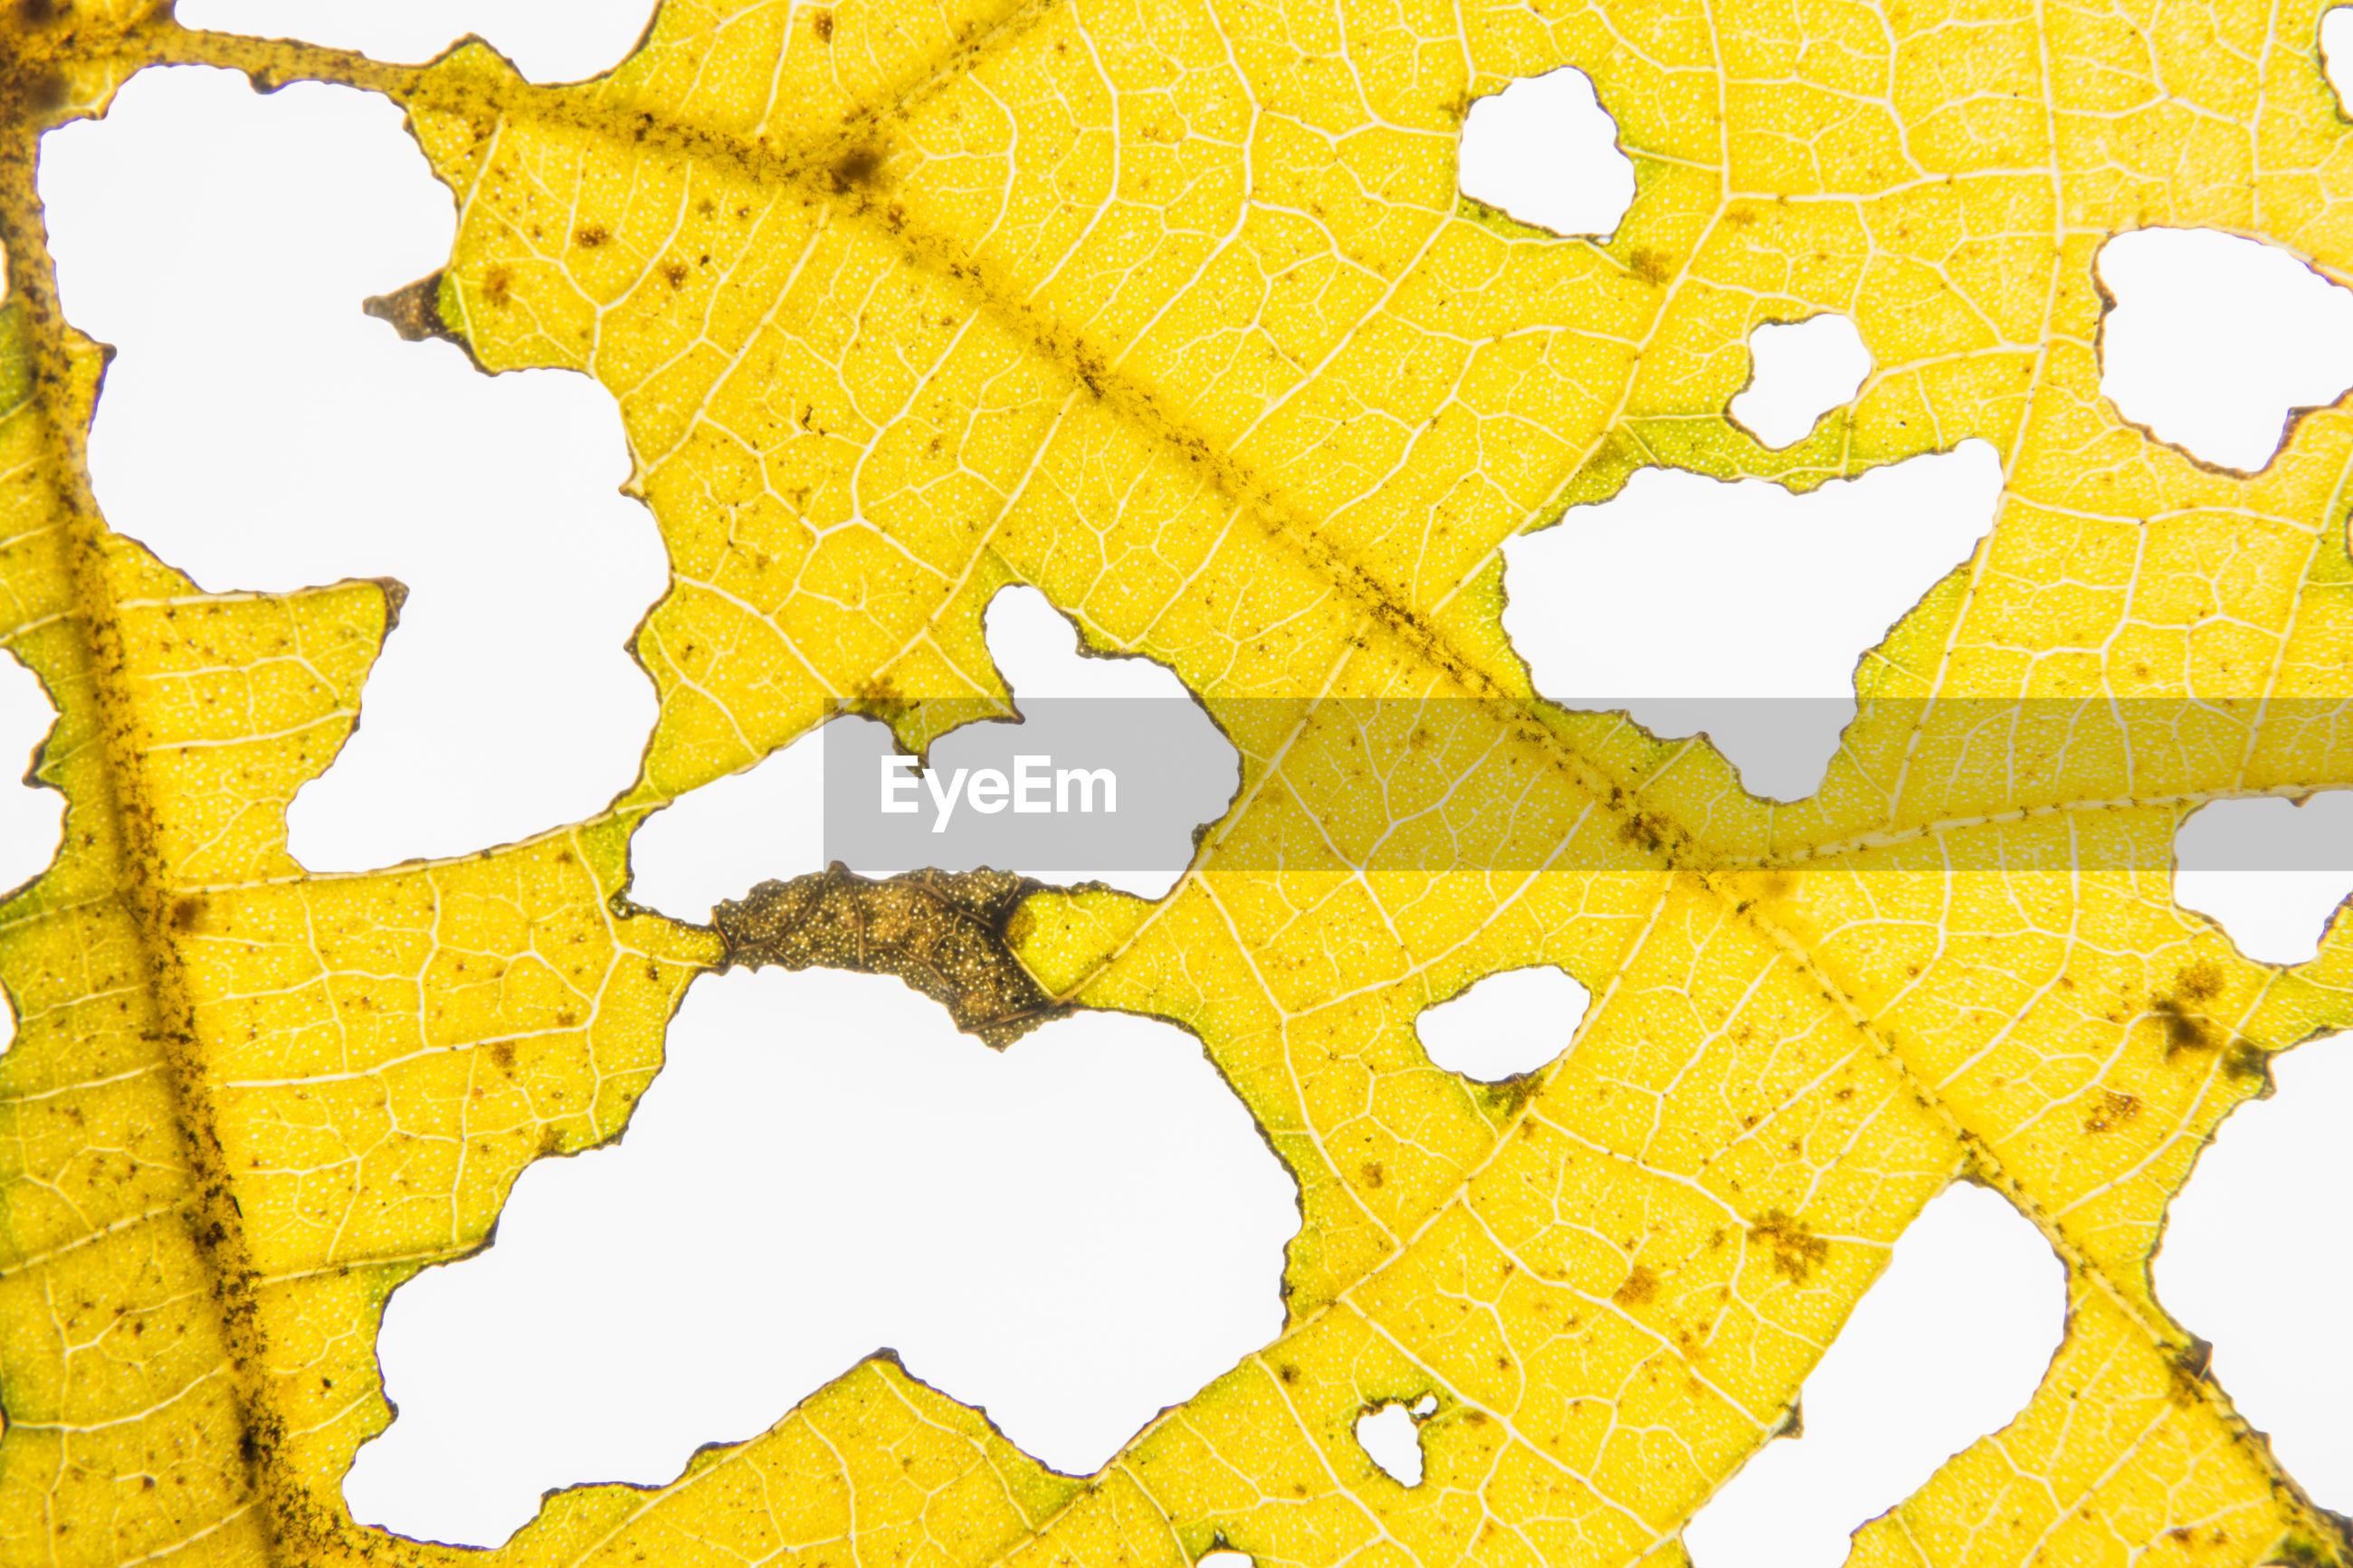 Full frame shot of damaged yellow leaf